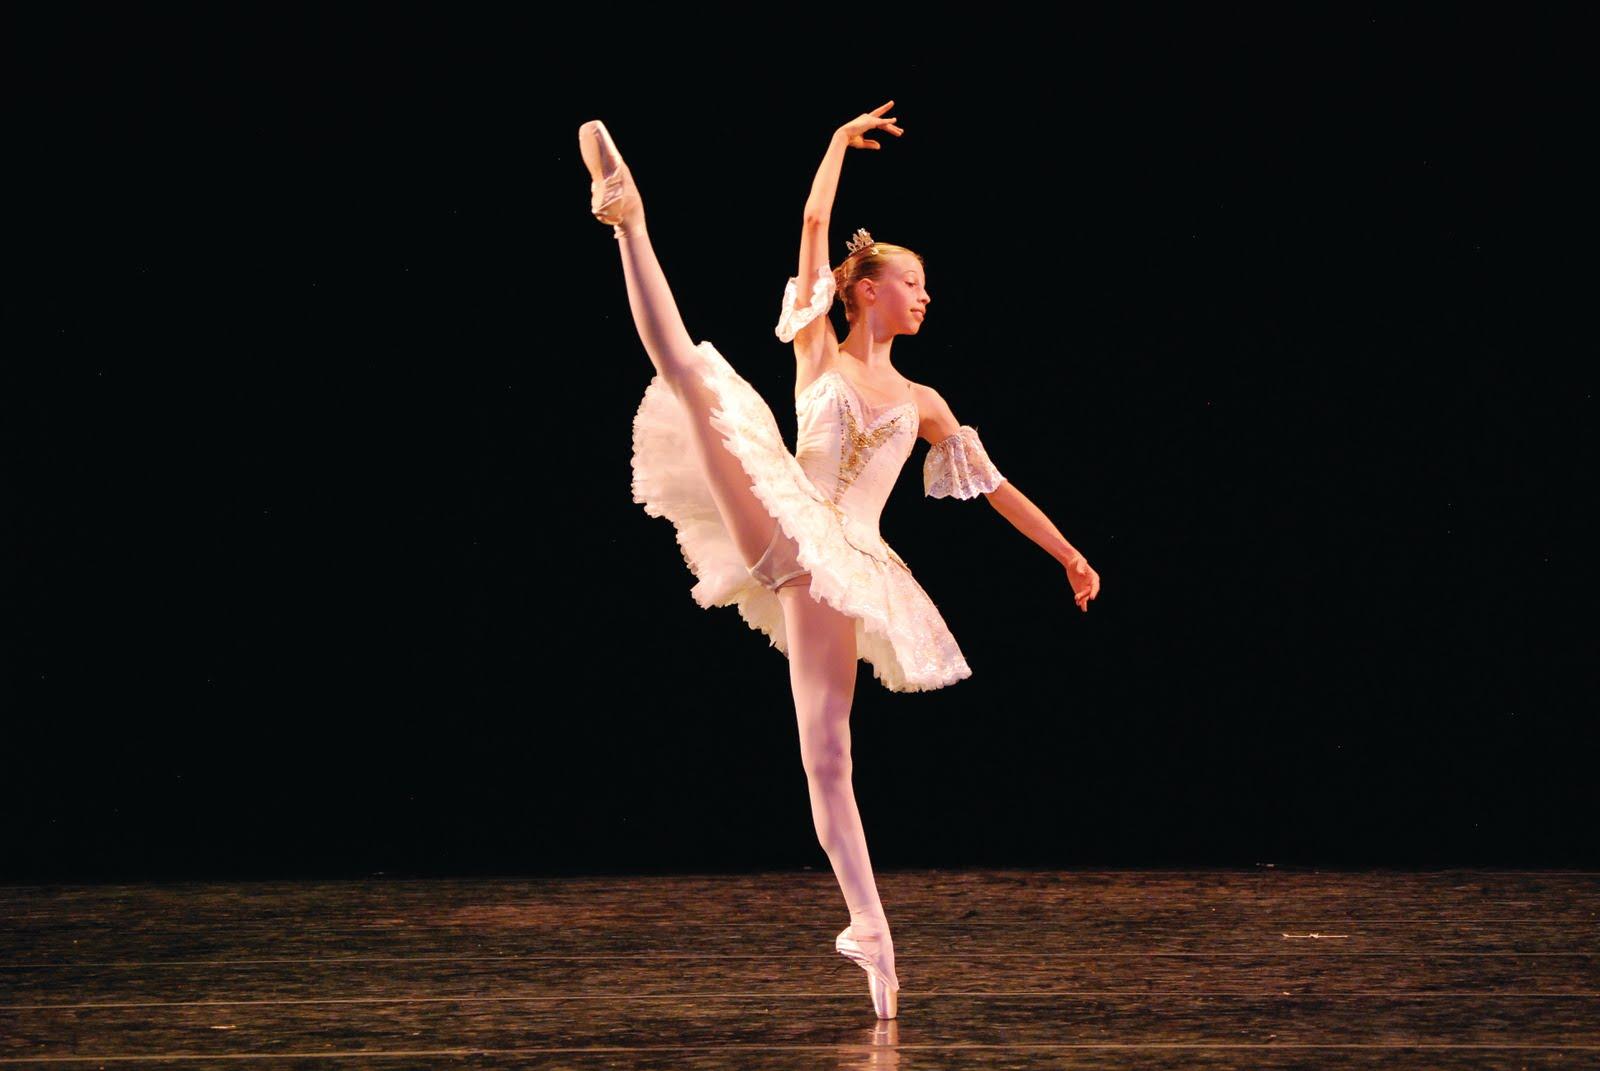 Gallery For gt Ballet Dancer Wallpaper Hd 1600x1071